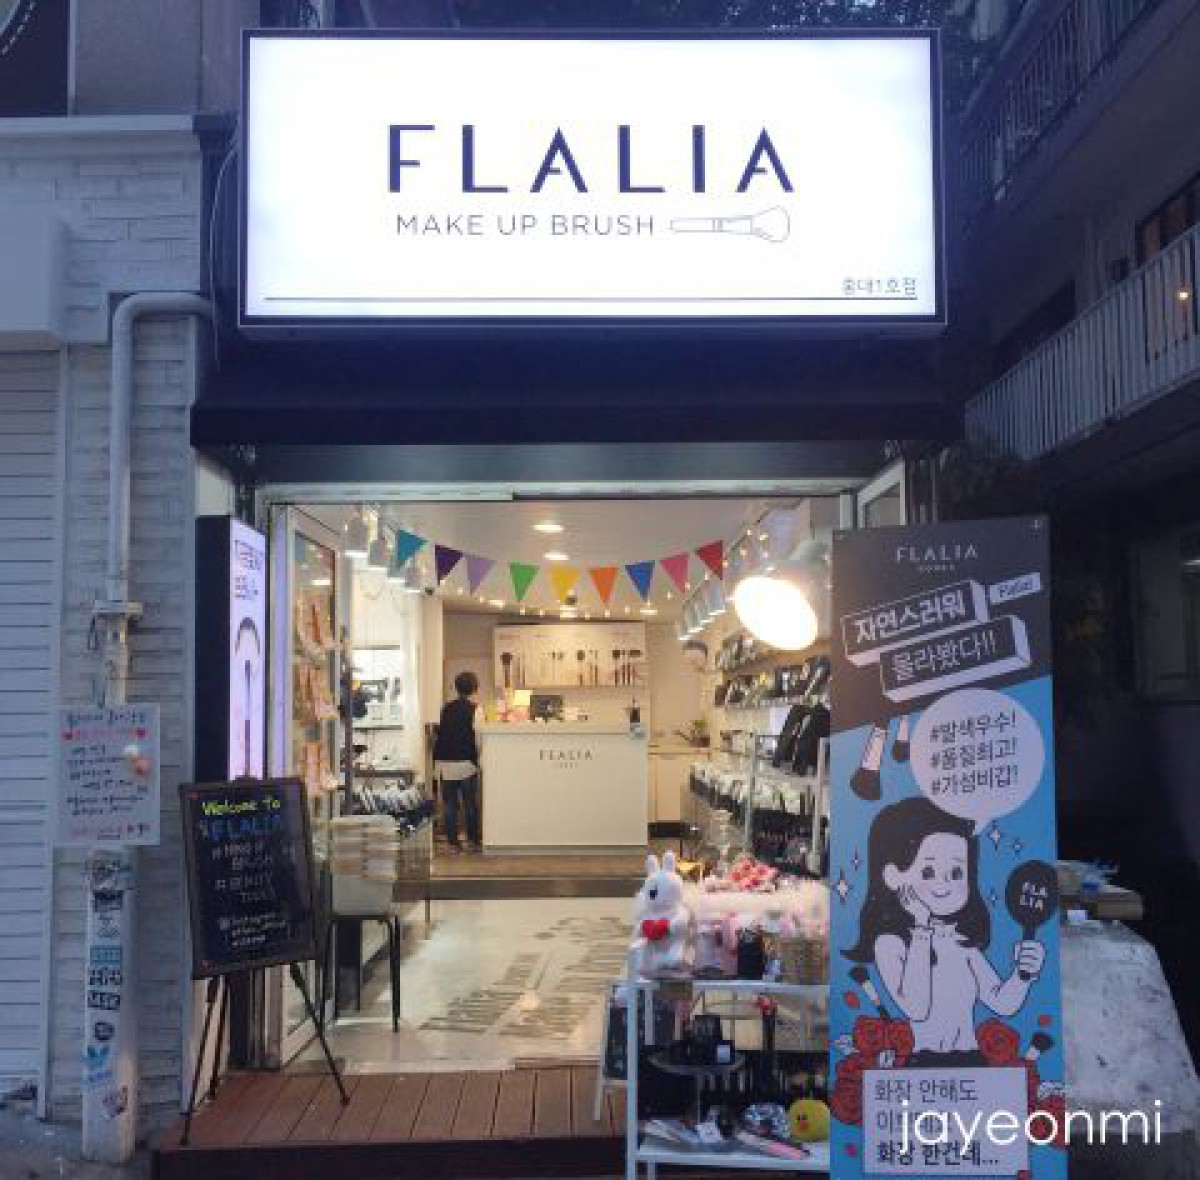 【Flalia】メイクブラシ激戦区!弘大に新たにオープン、FLALIA1号店に行ってきました☆